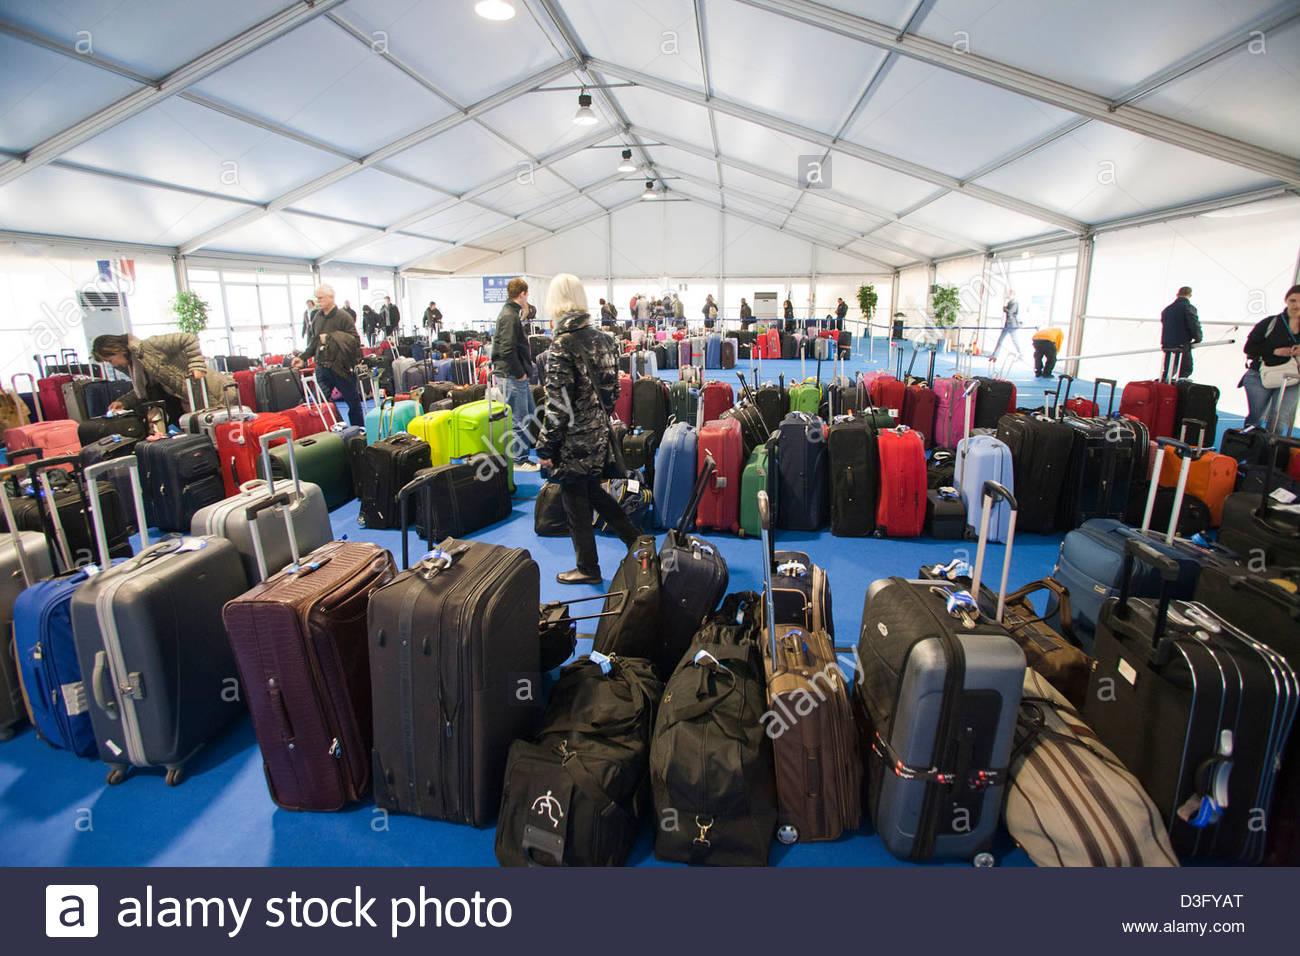 Baggage Claim Costa Crociere Cruise Line Port Of Savona